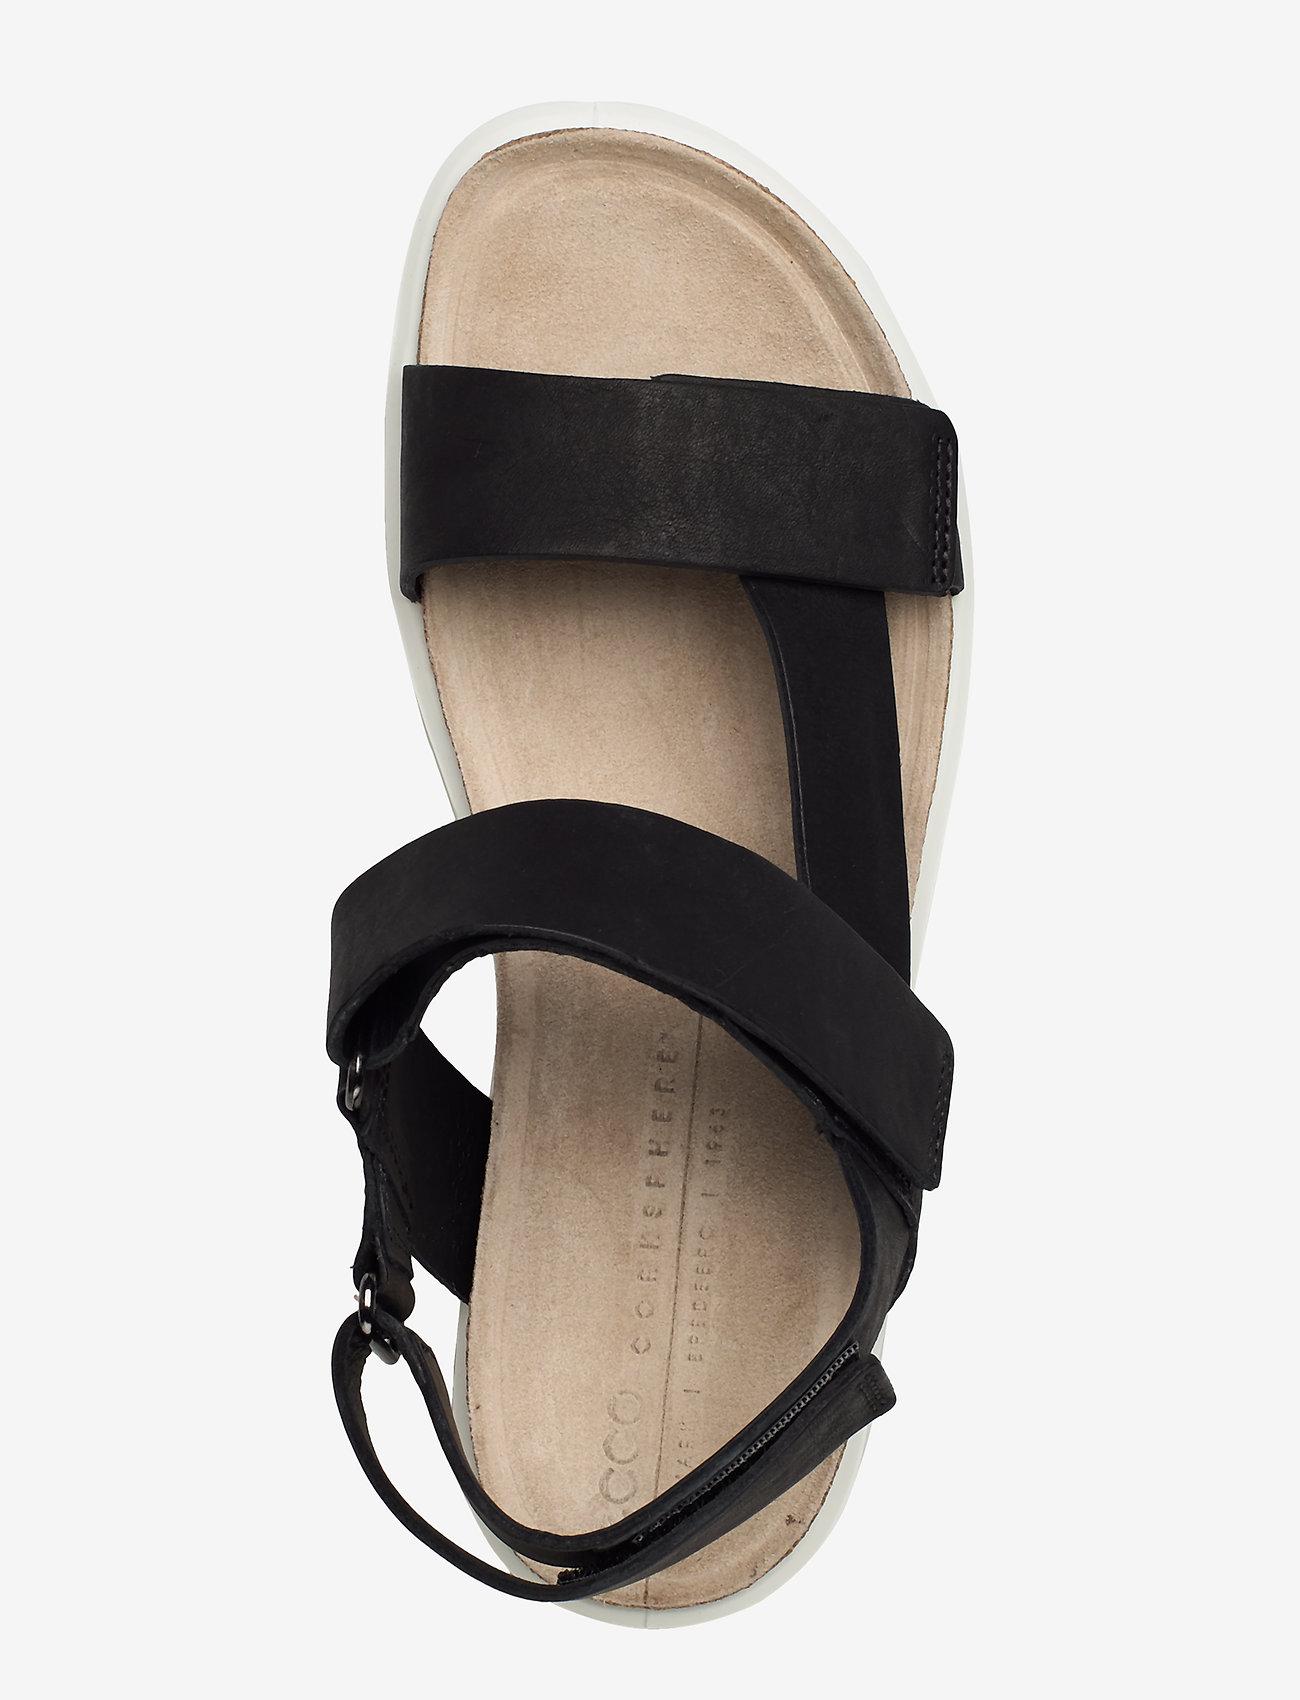 Corksphere Sandal (Black) - ECCO